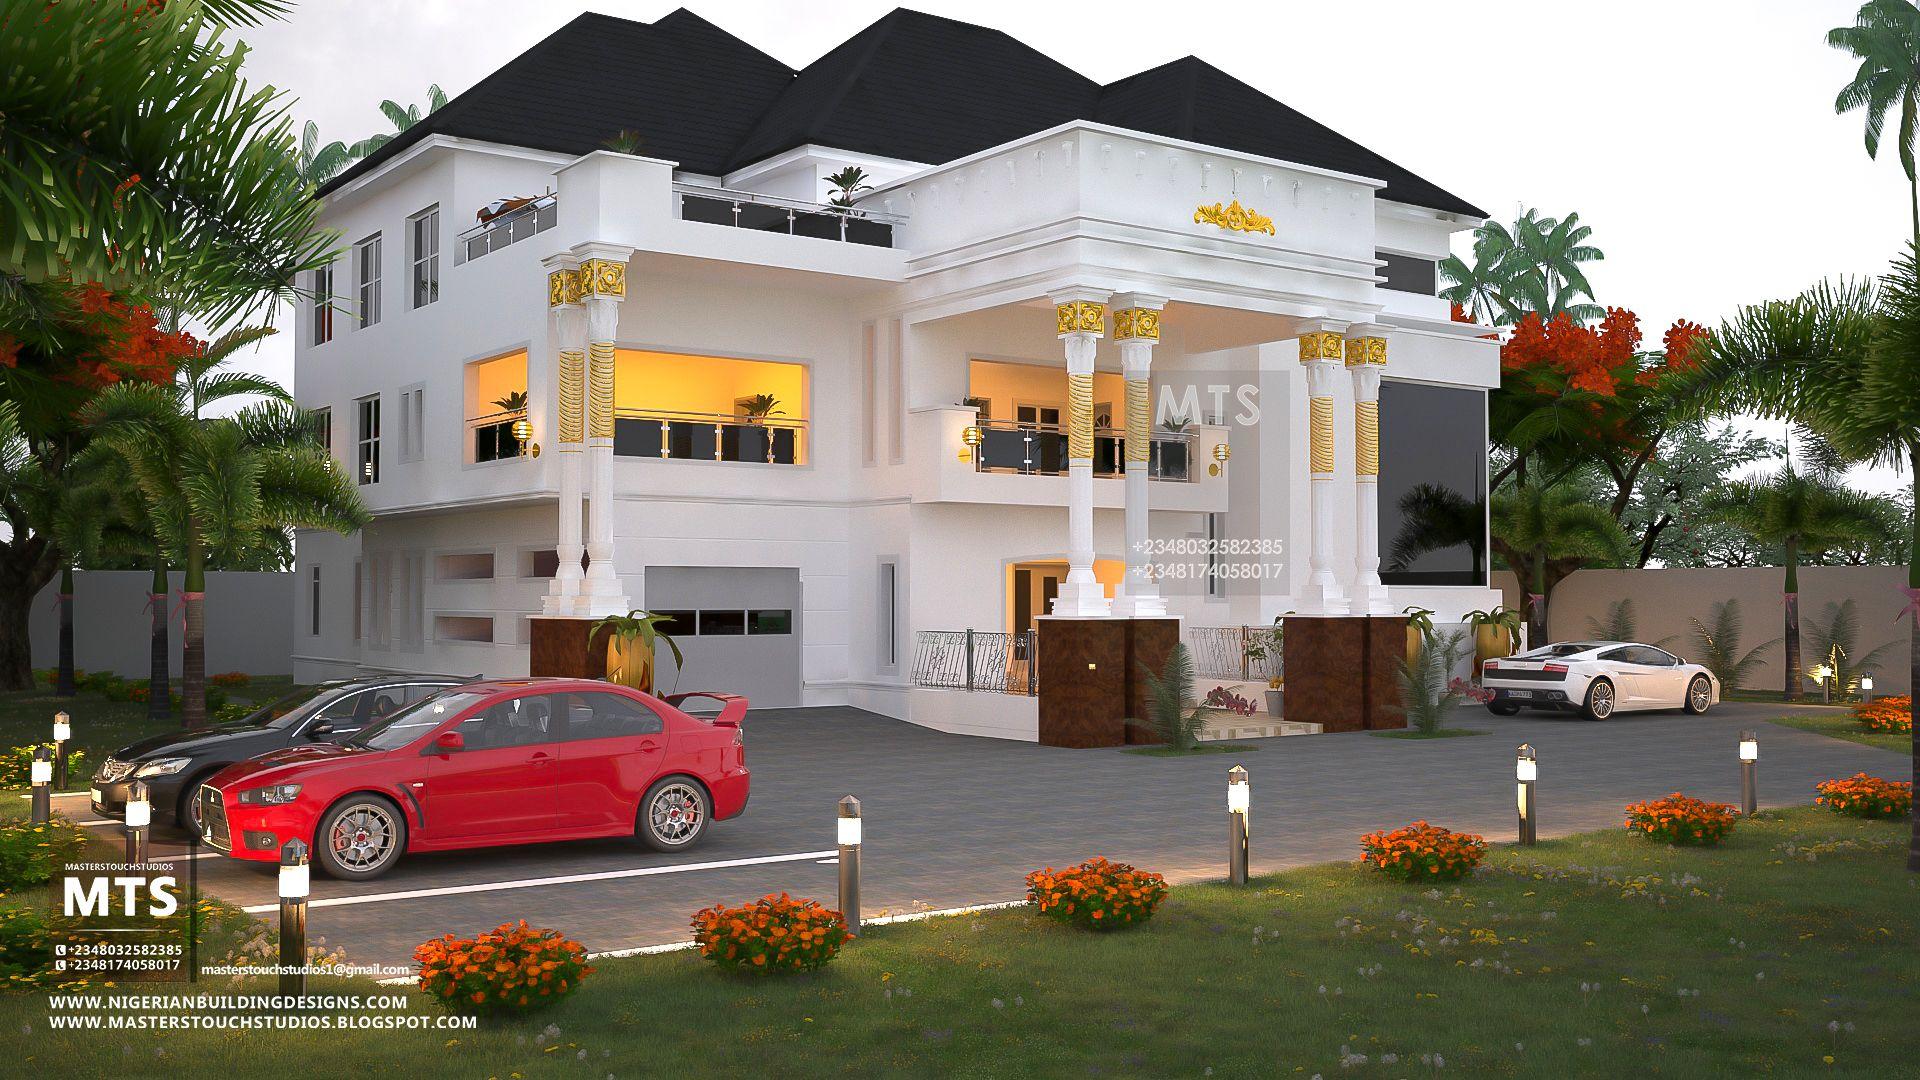 8 Bedroom Duplex Rf 8001 Best Modern House Design Unique House Design House Plans Mansion